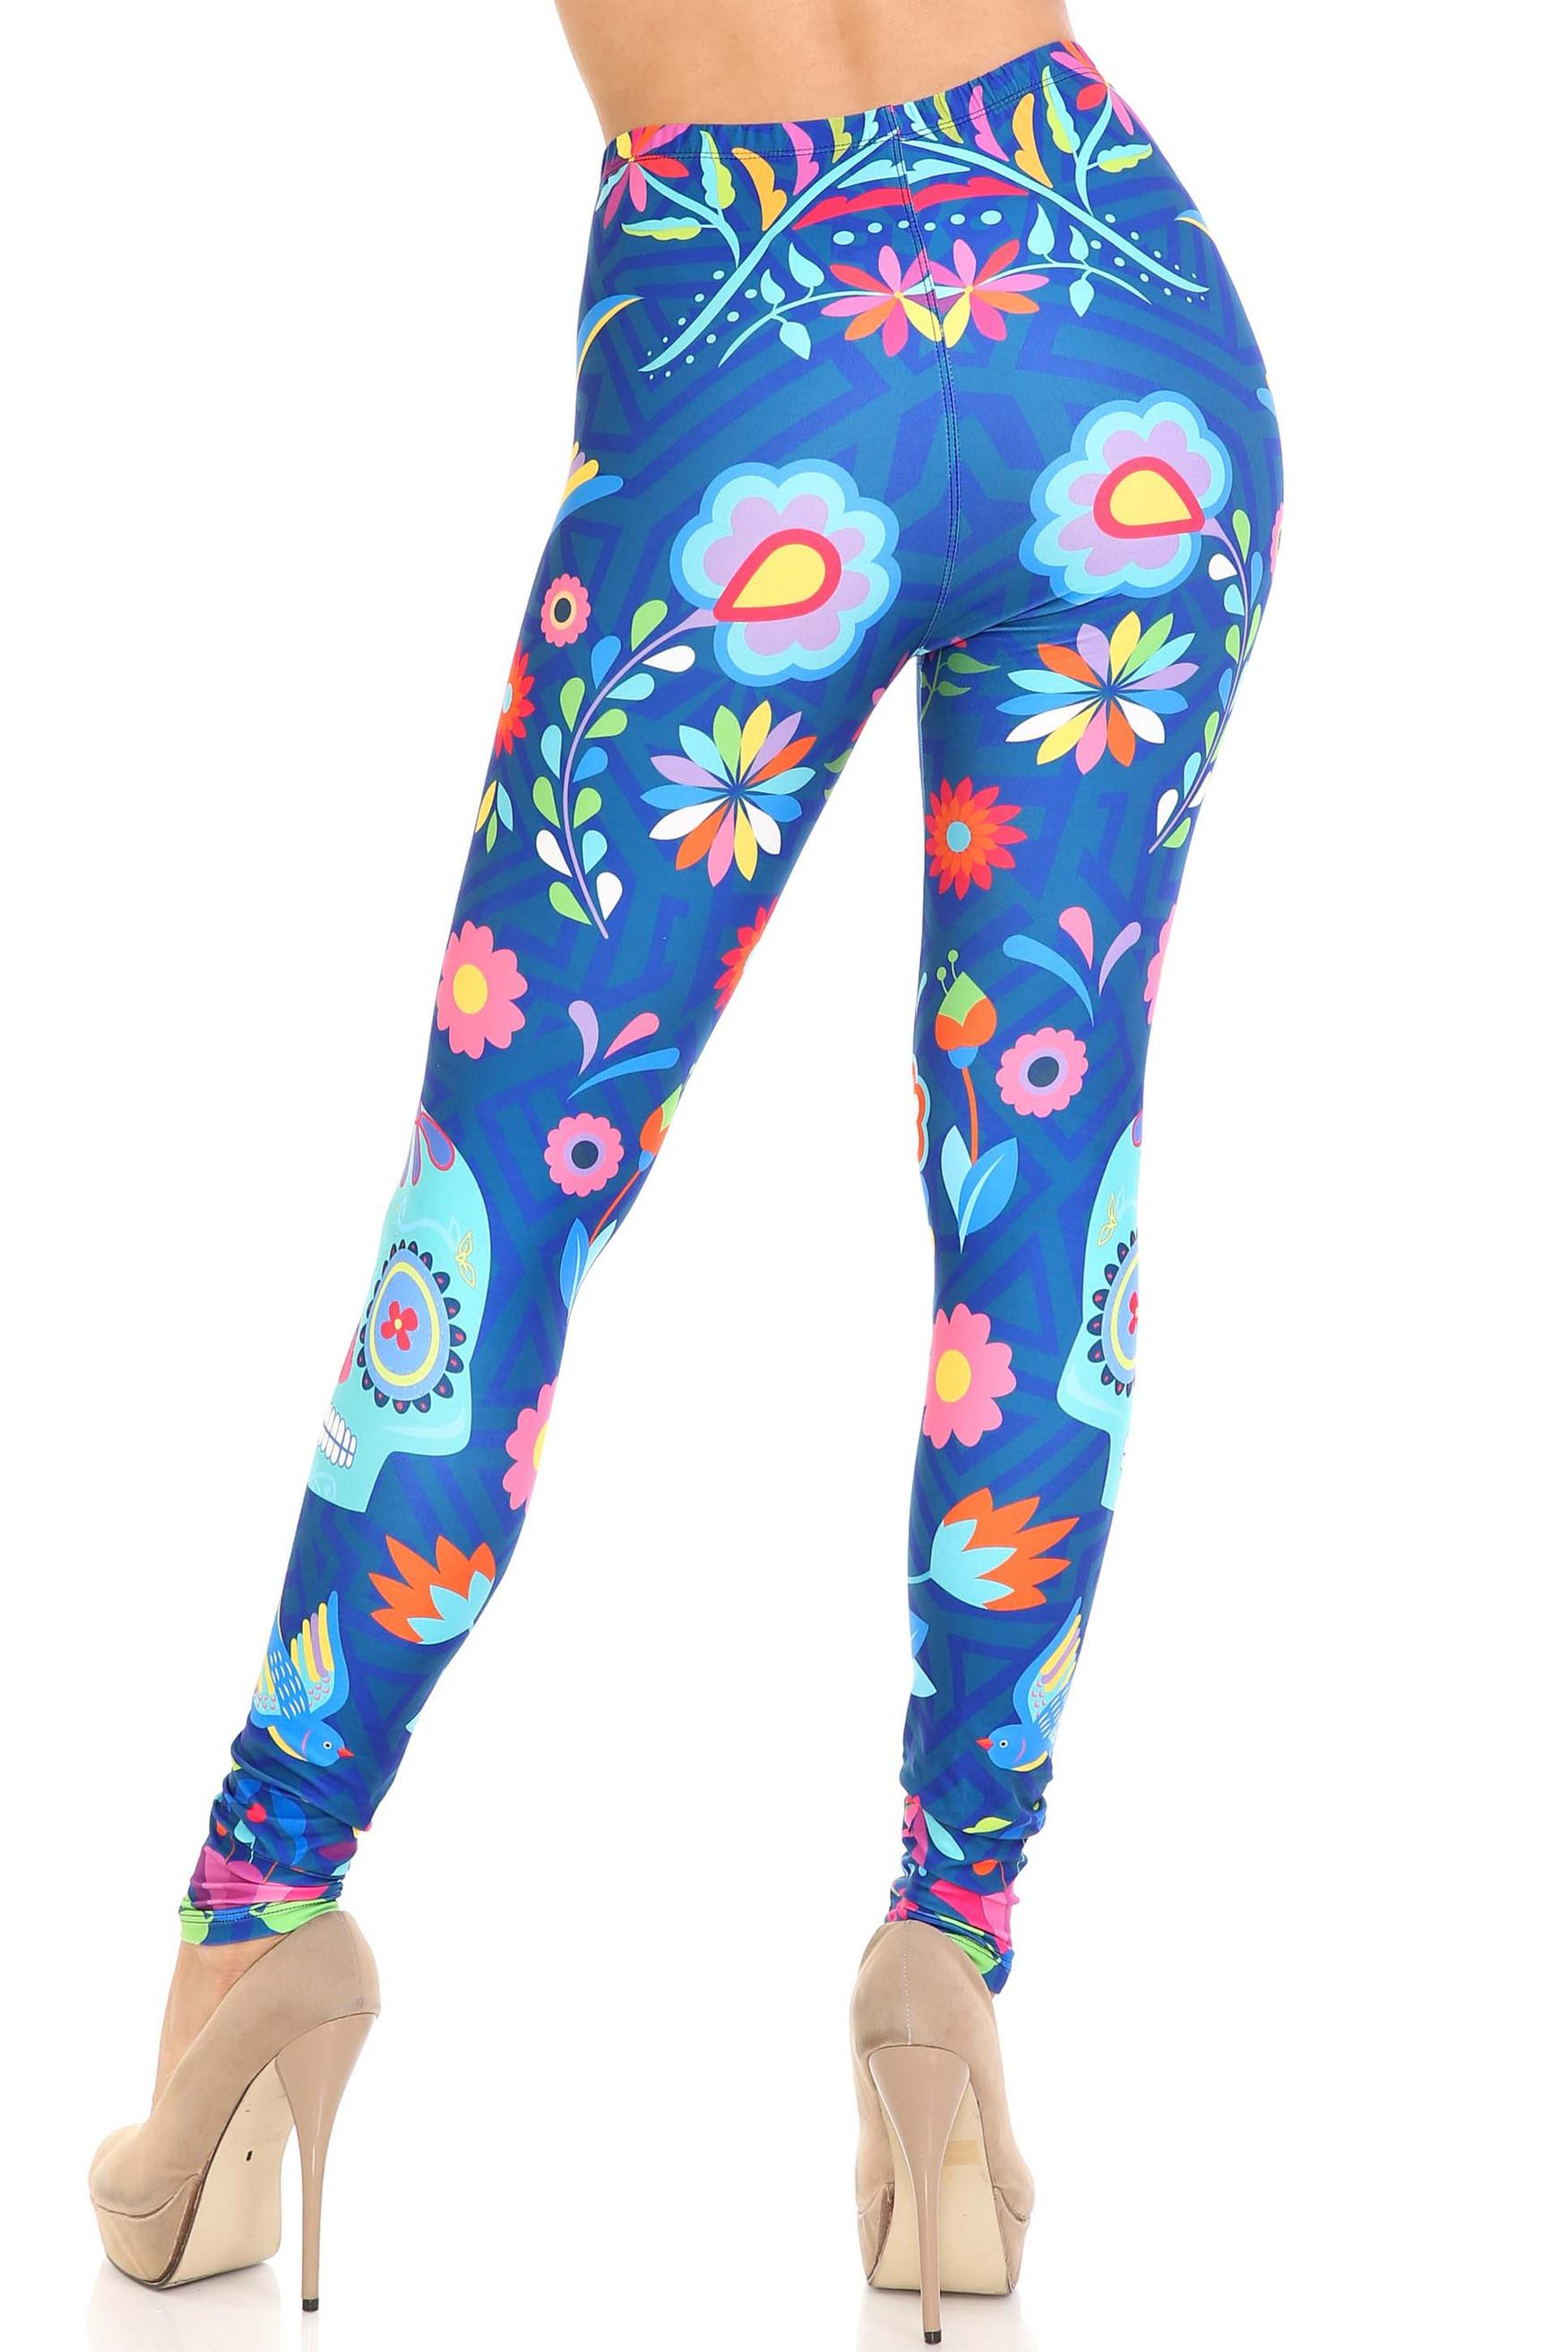 Creamy Soft Garden of Eden Sugar Skull Plus Size Leggings - USA Fashion™